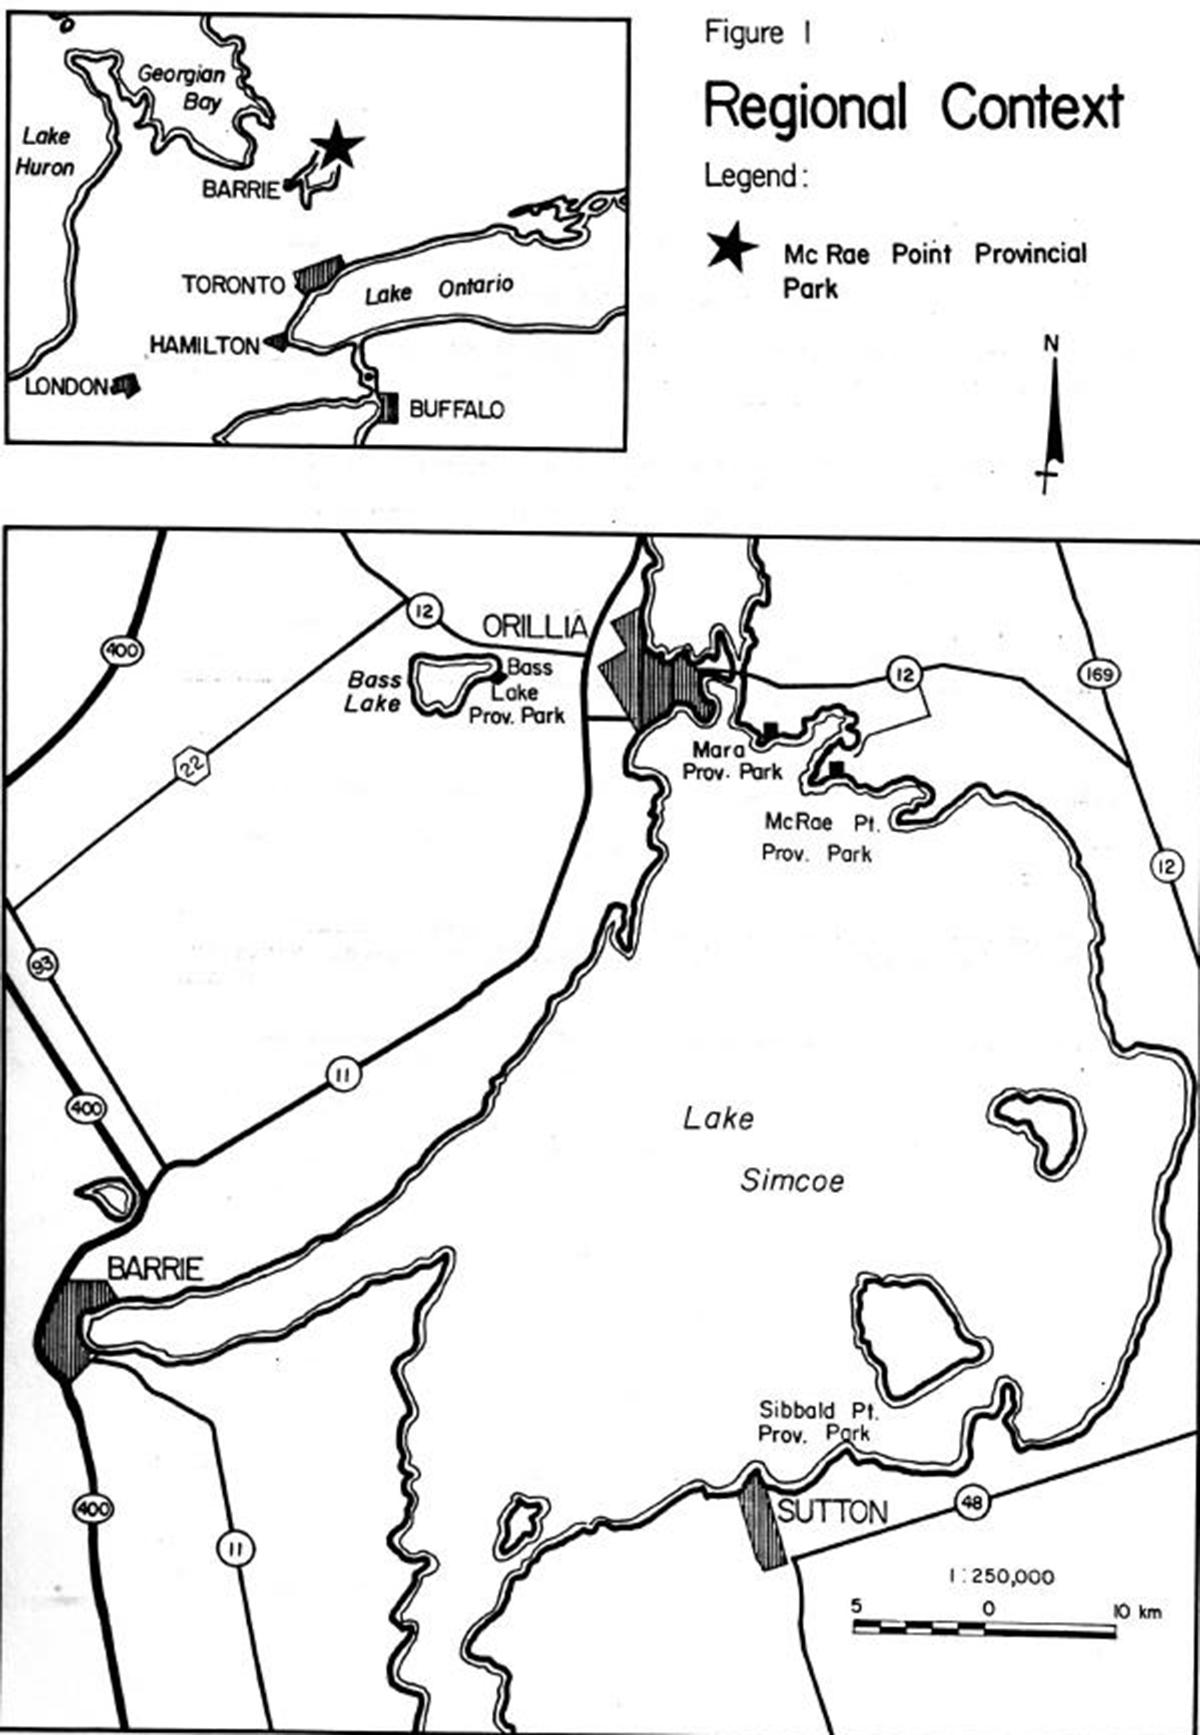 Mcrae Point Provincial Park Management Plan Woods Mowing Machine 6100 Wiring Digram Enlarge Figure 1 Regional Context